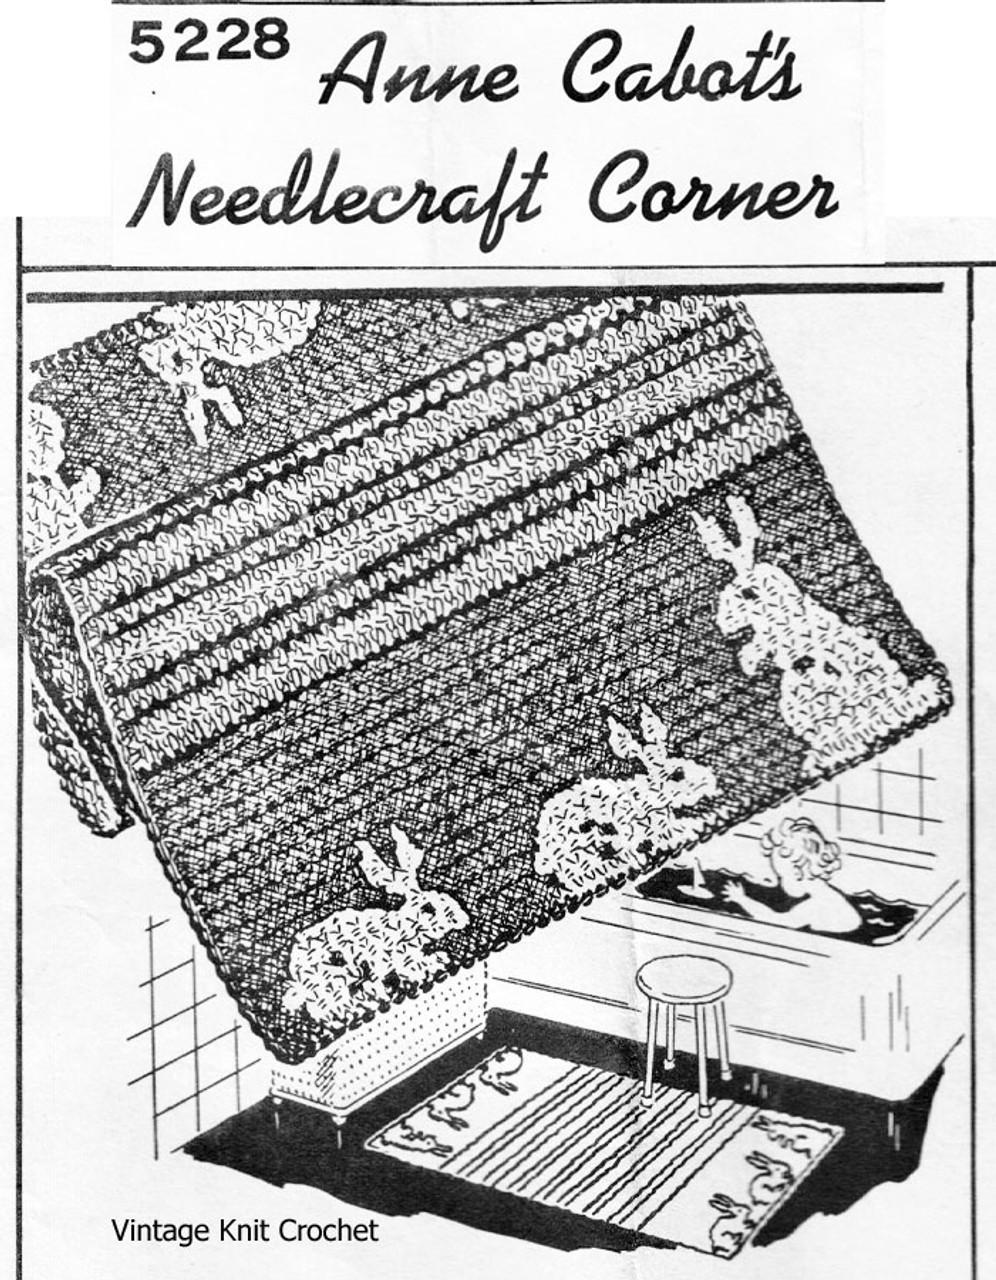 Crochet Bathroom, Nursery Rug Pattern, Bunny, Anne Cabot 5228